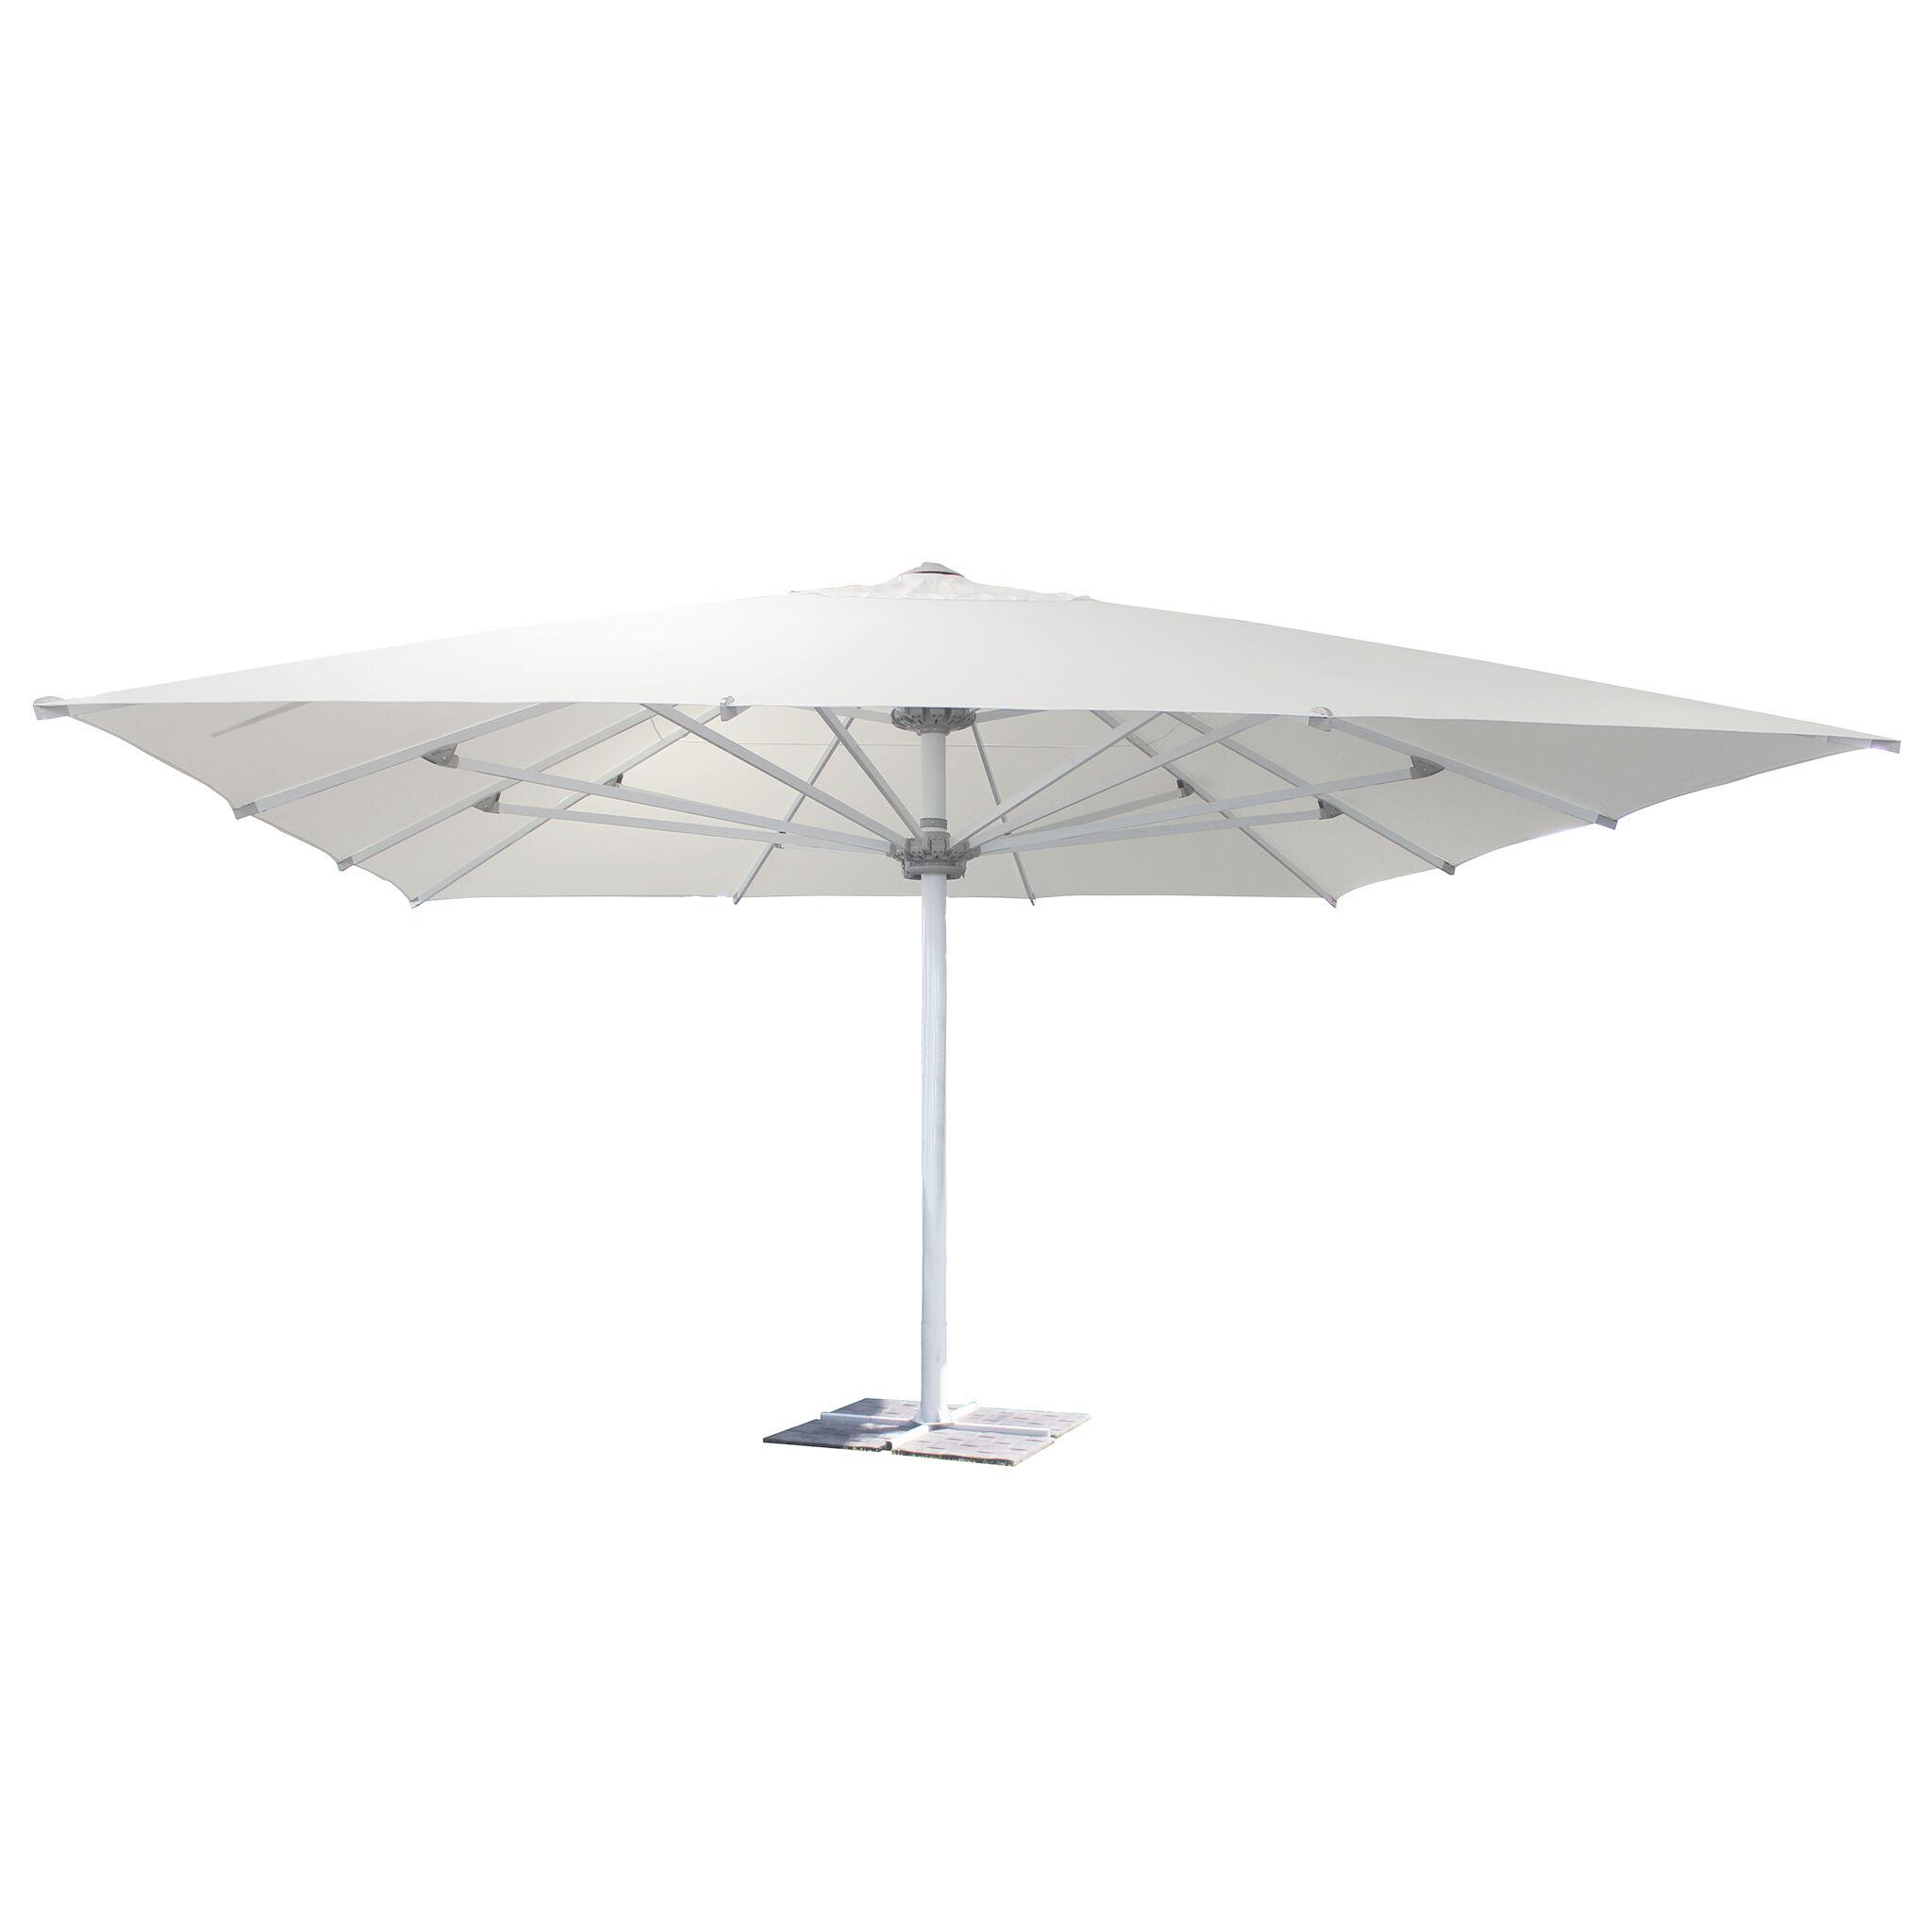 Milani Home ALABARDA - ombrellone da giardino 5 x 5 palo centrale